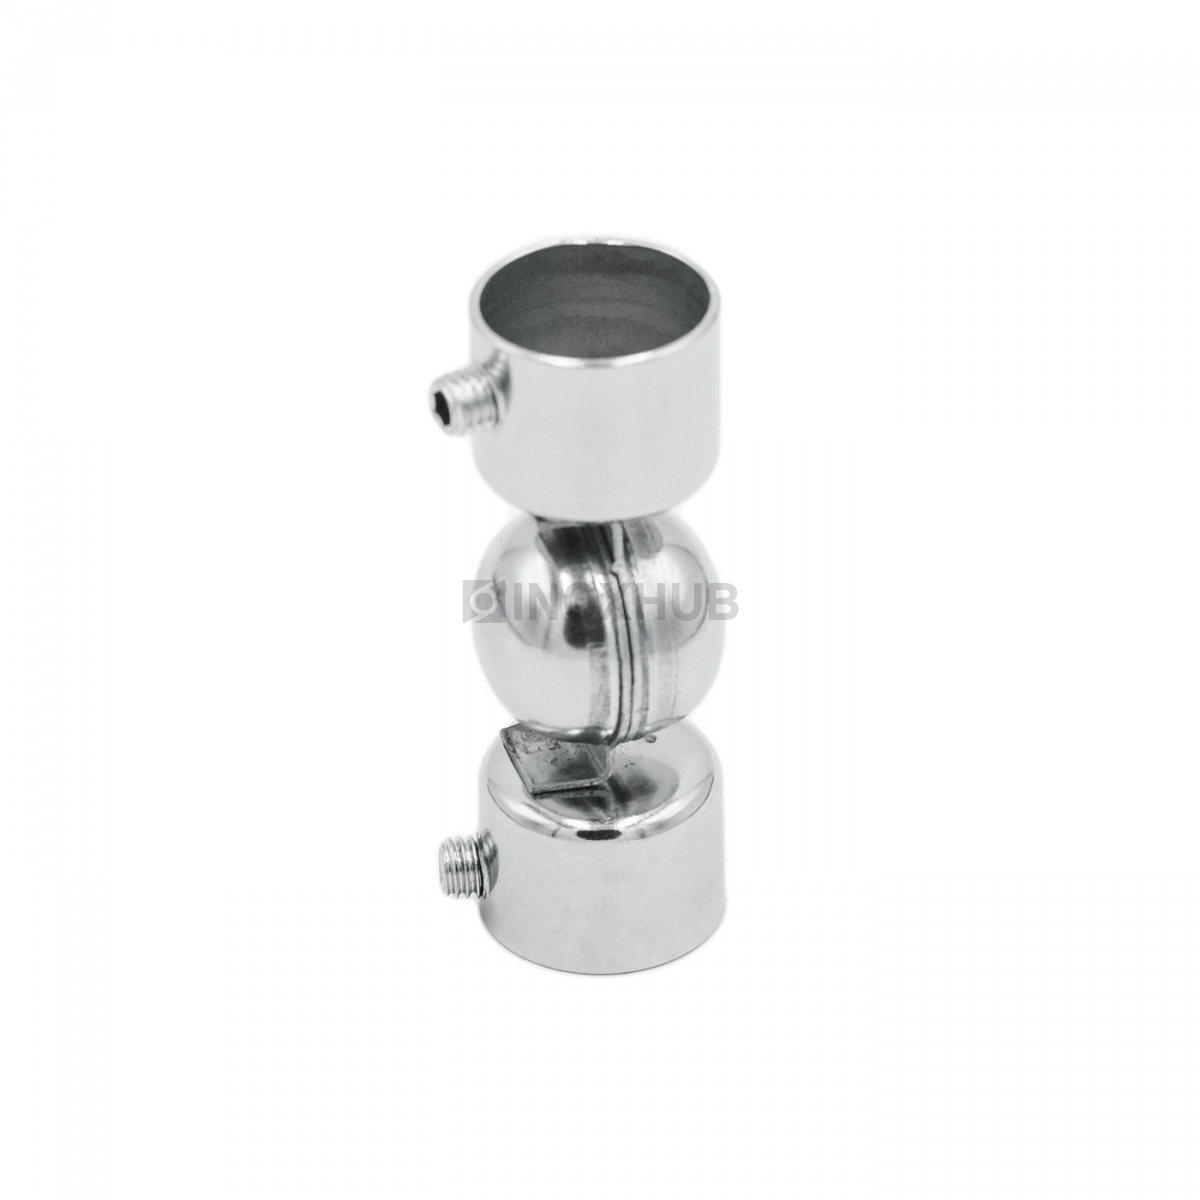 Поворот штамп. шаровой внешний Ø16.0 мм, AISI 304, GRIT 600